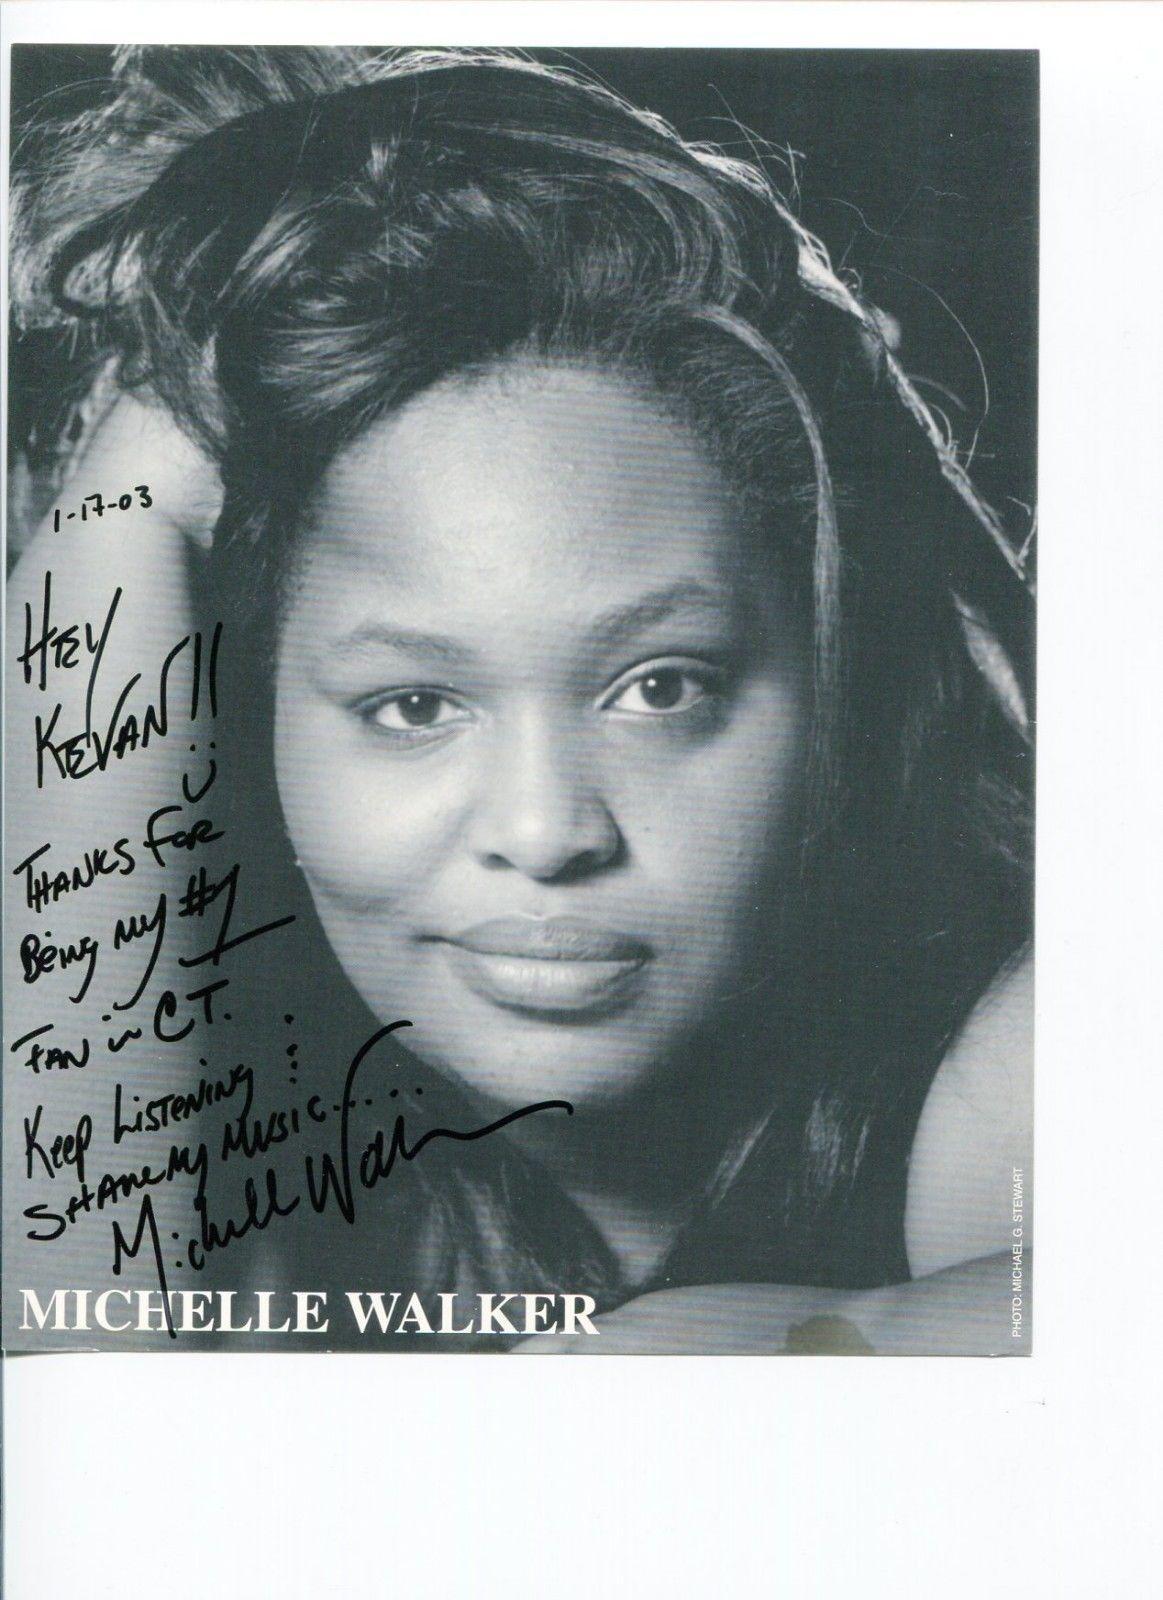 Michelle Walker Jazz Singer Songwriter Signed Autograph Photo